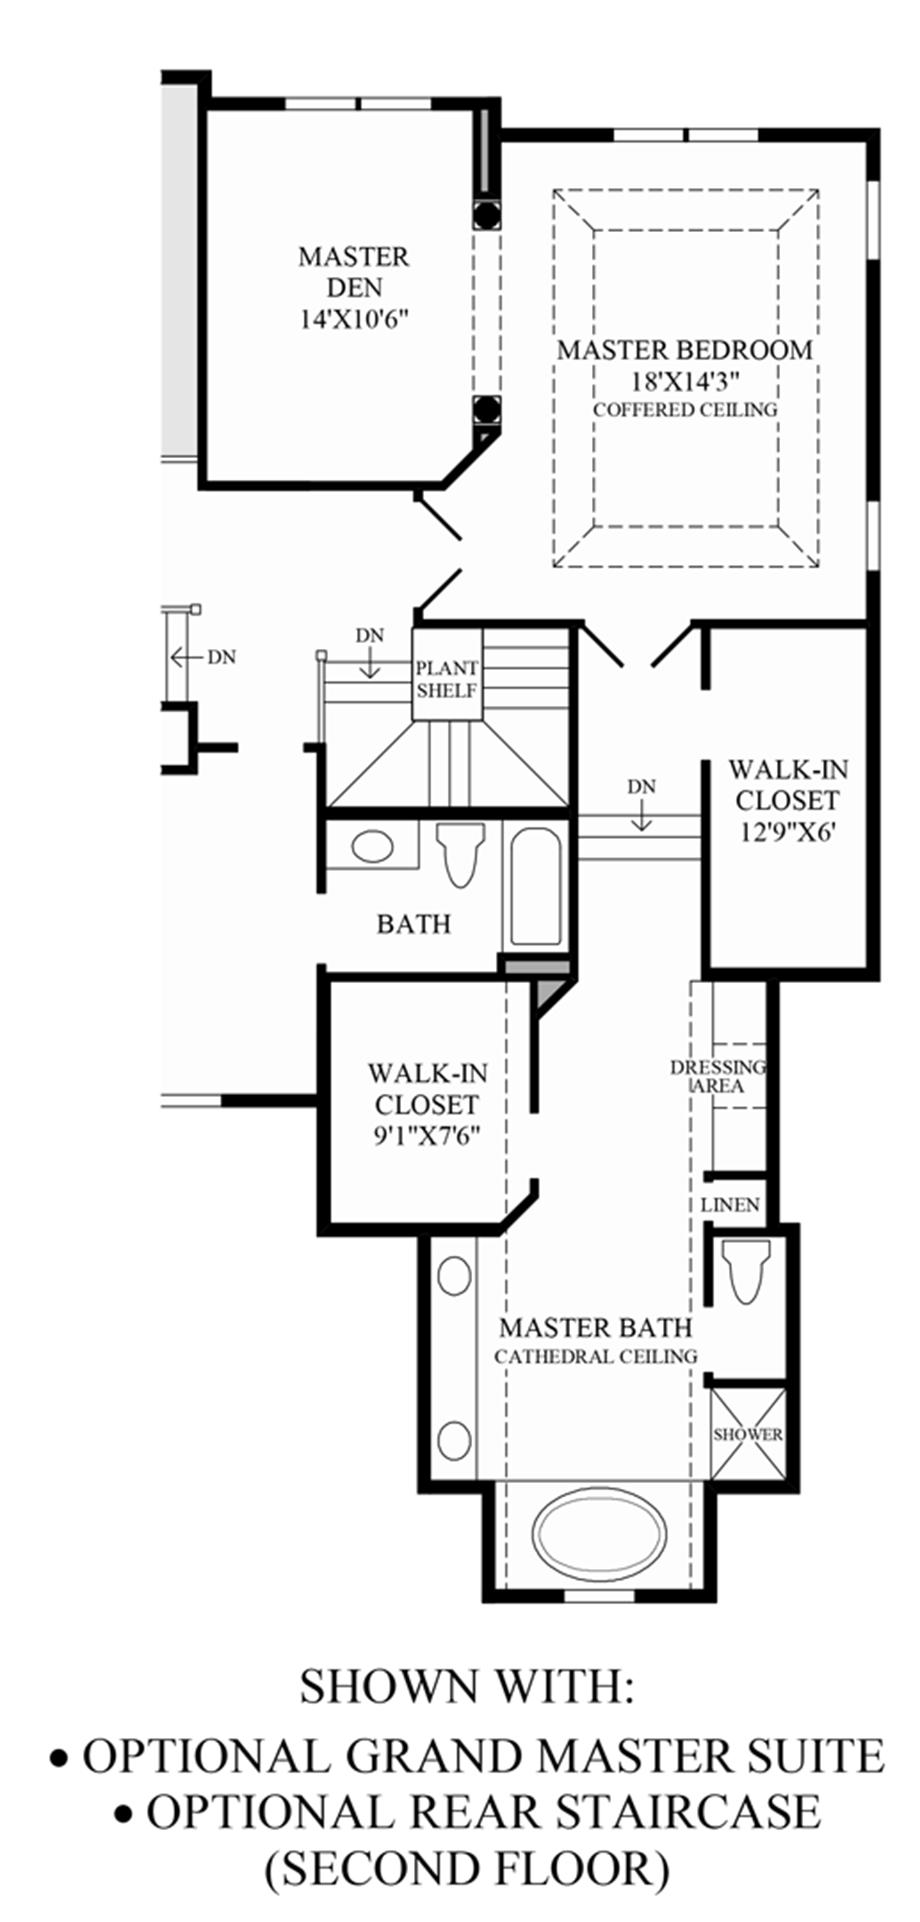 Optional Rear Staircase (2nd Floor) & Grand Master Suite Floor Plan